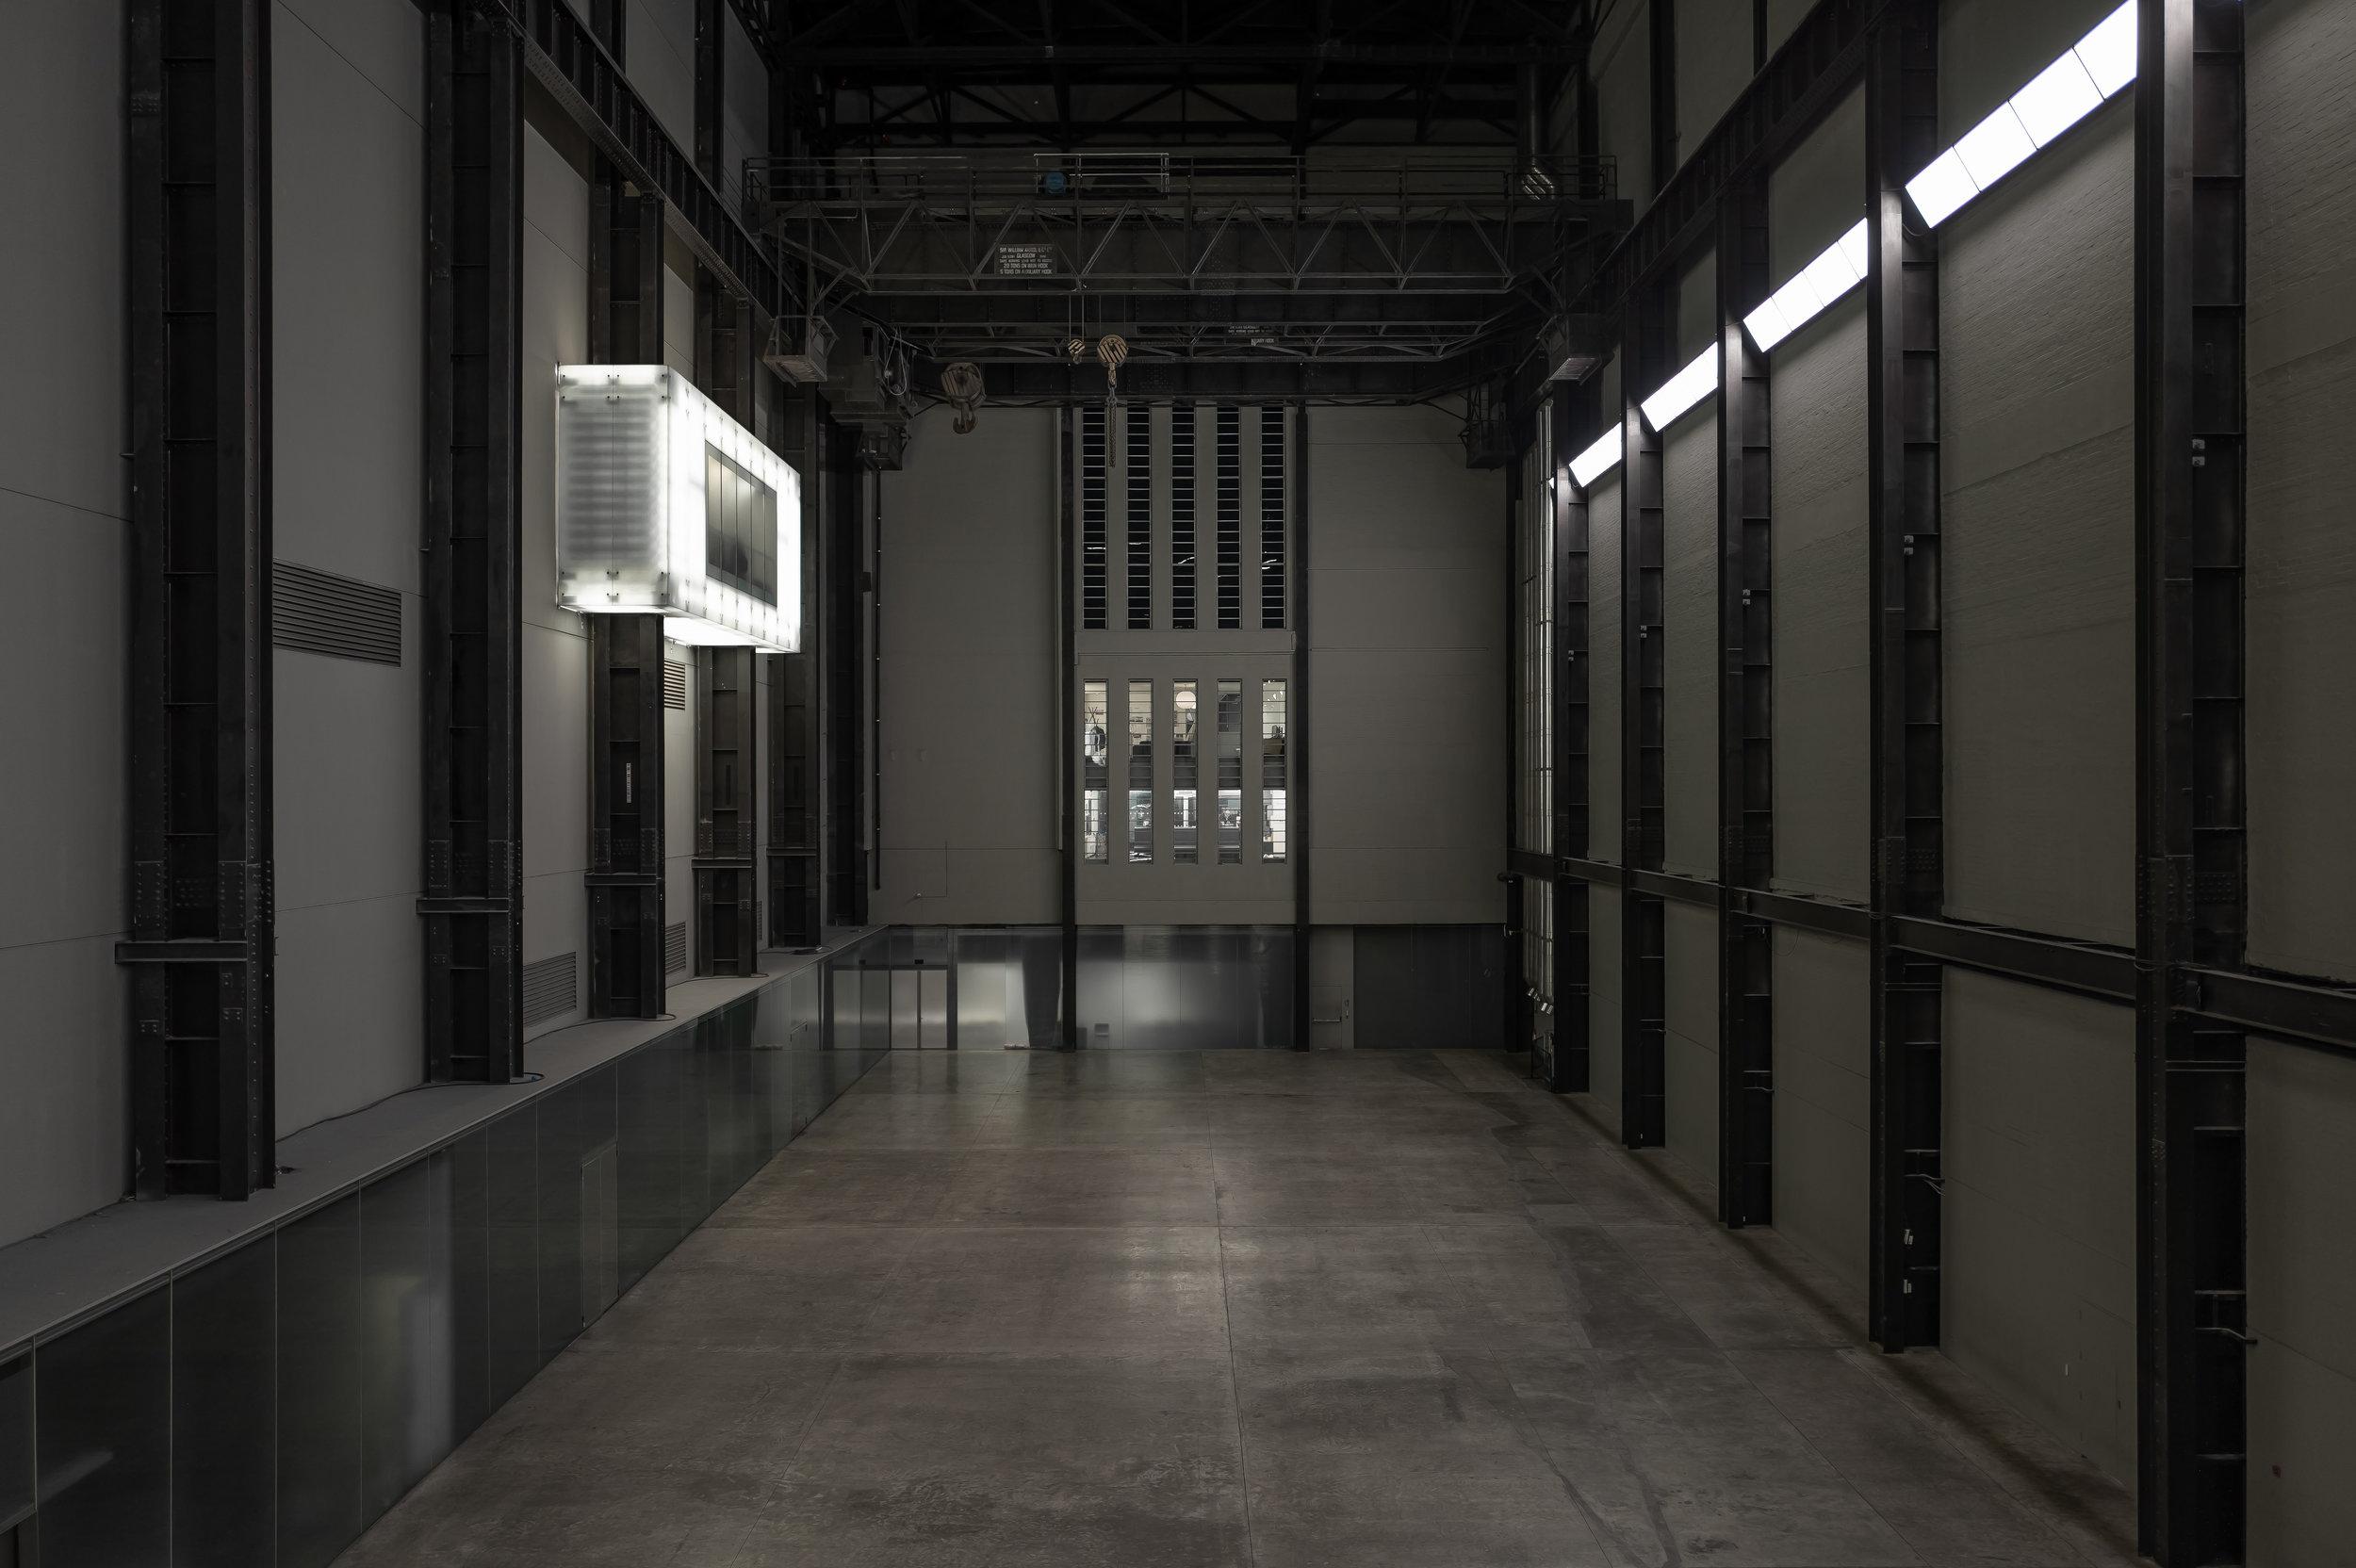 London / Tate Modern